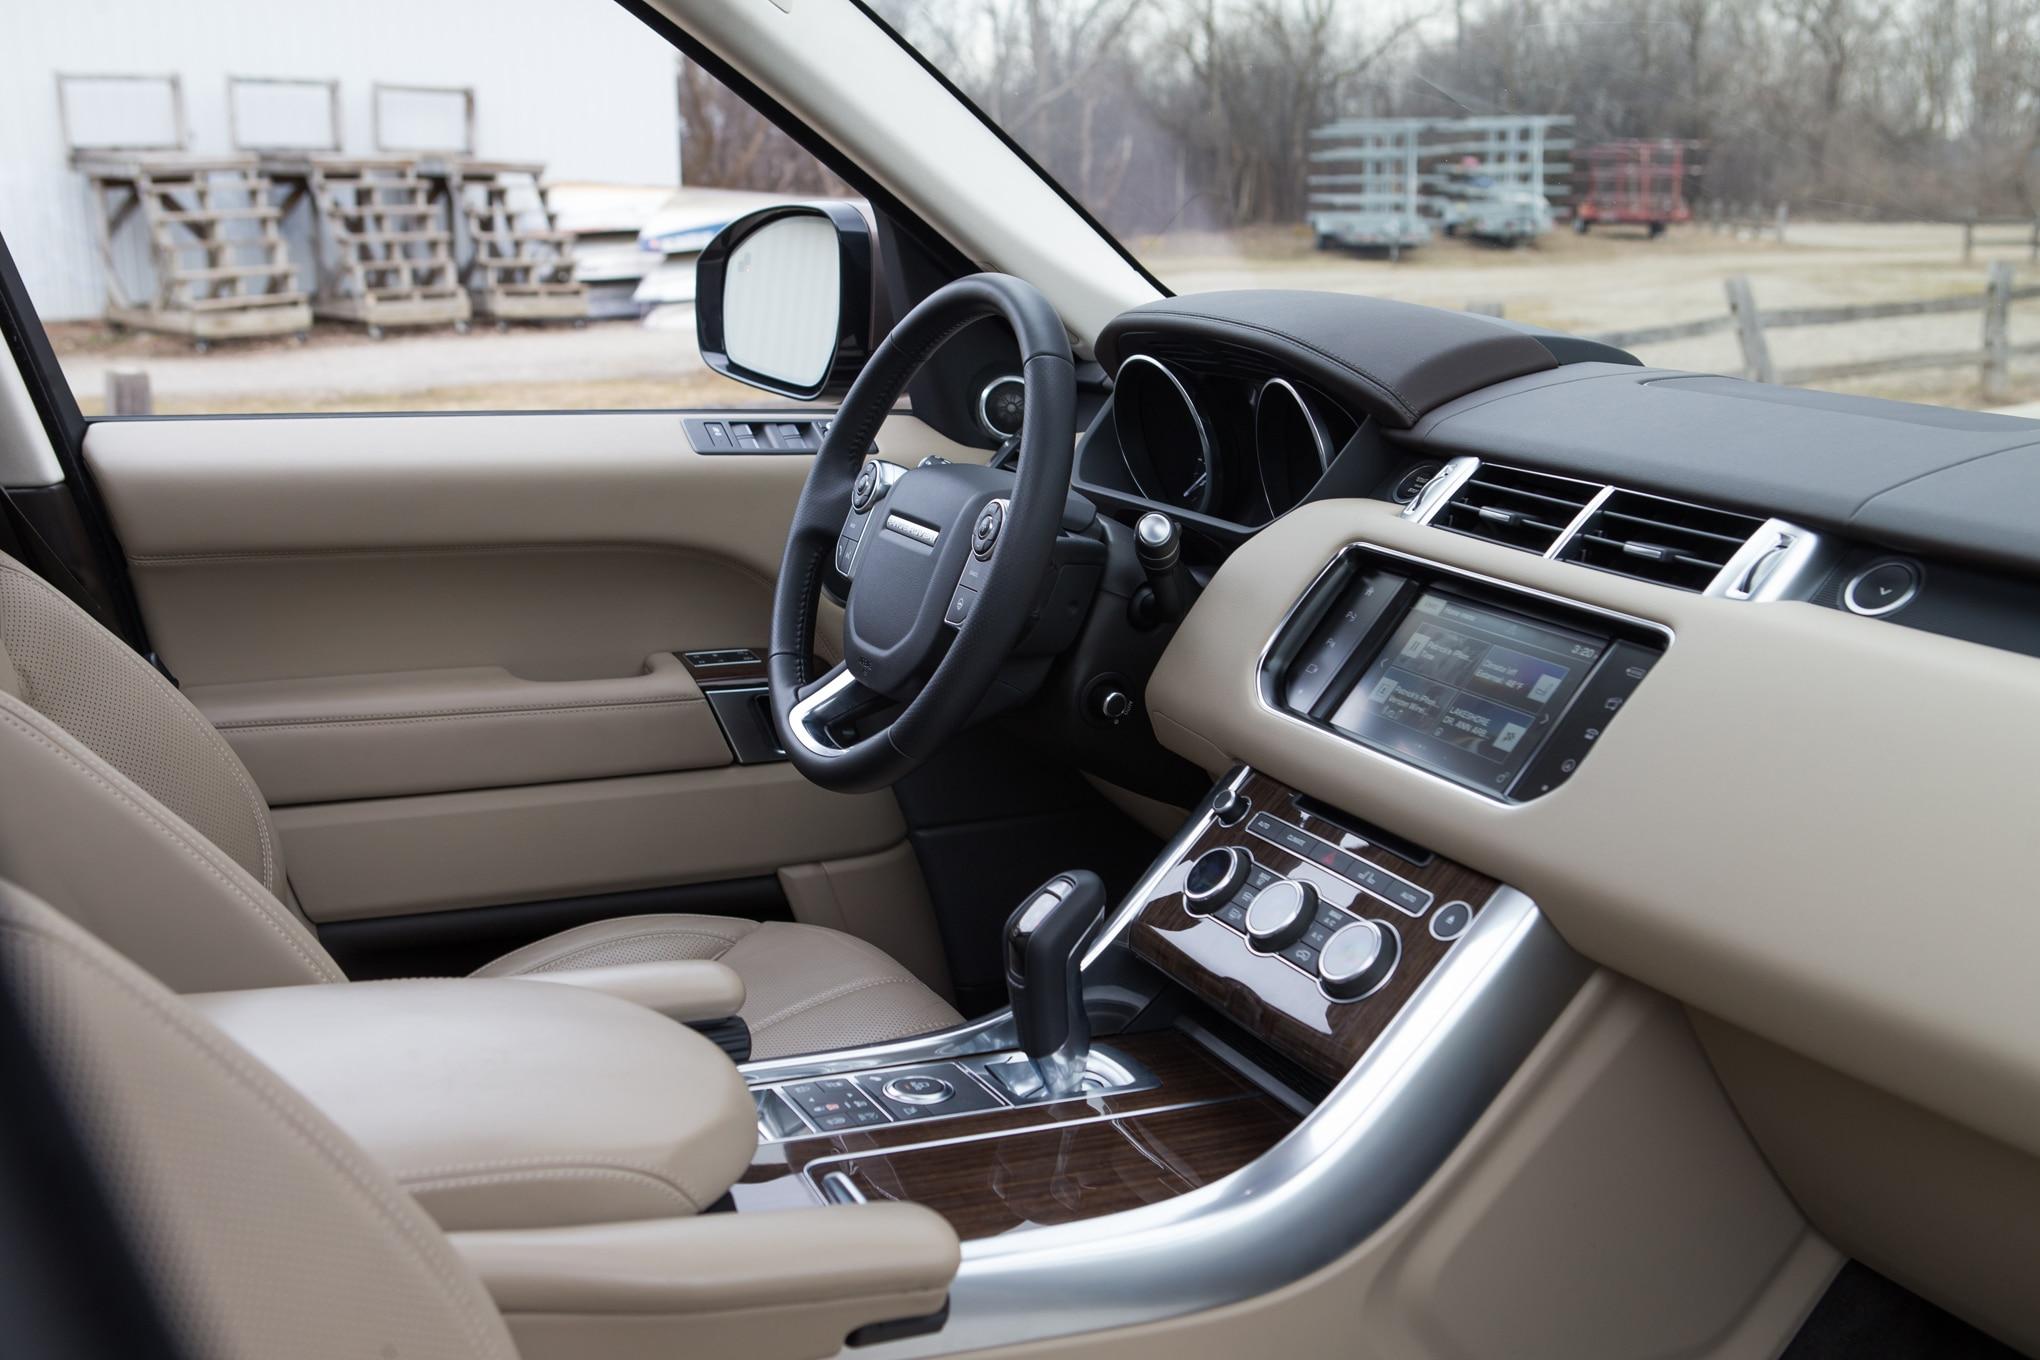 Electric Or Diesel Bmw X5 Xdrive40e Vs Range Rover Sport